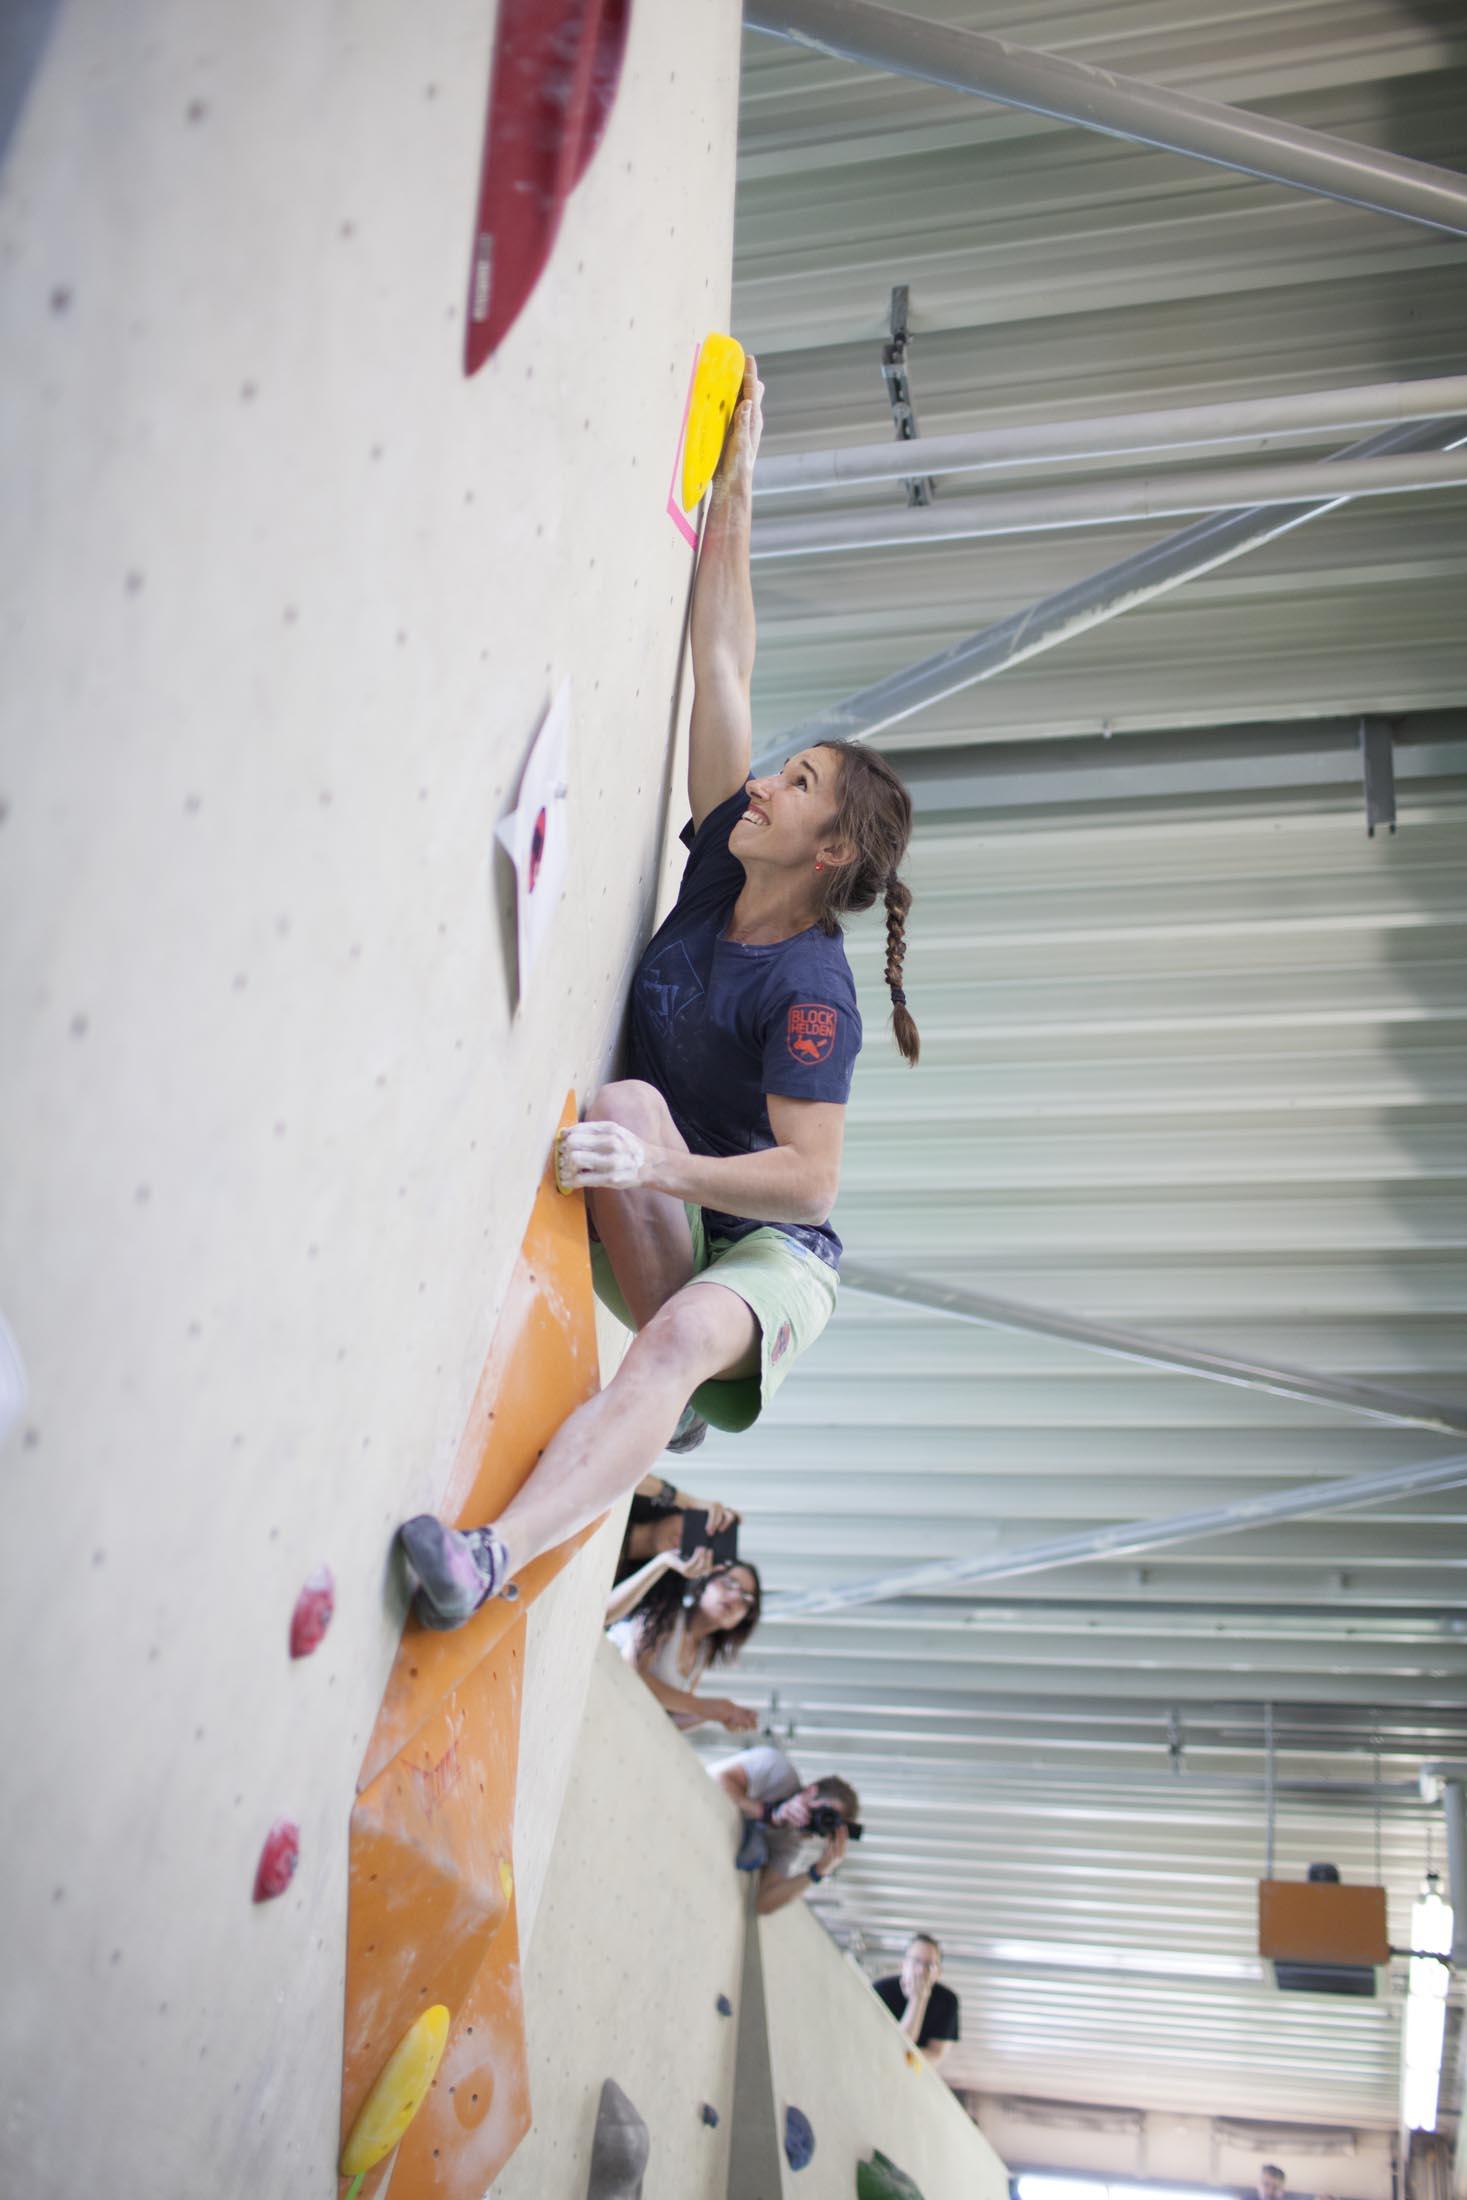 Finale, internationaler bouldercup Frankenjura 2016, BLOCKHELDEN Erlangen, Mammut, Bergfreunde.de, Boulderwettkampf07092016529